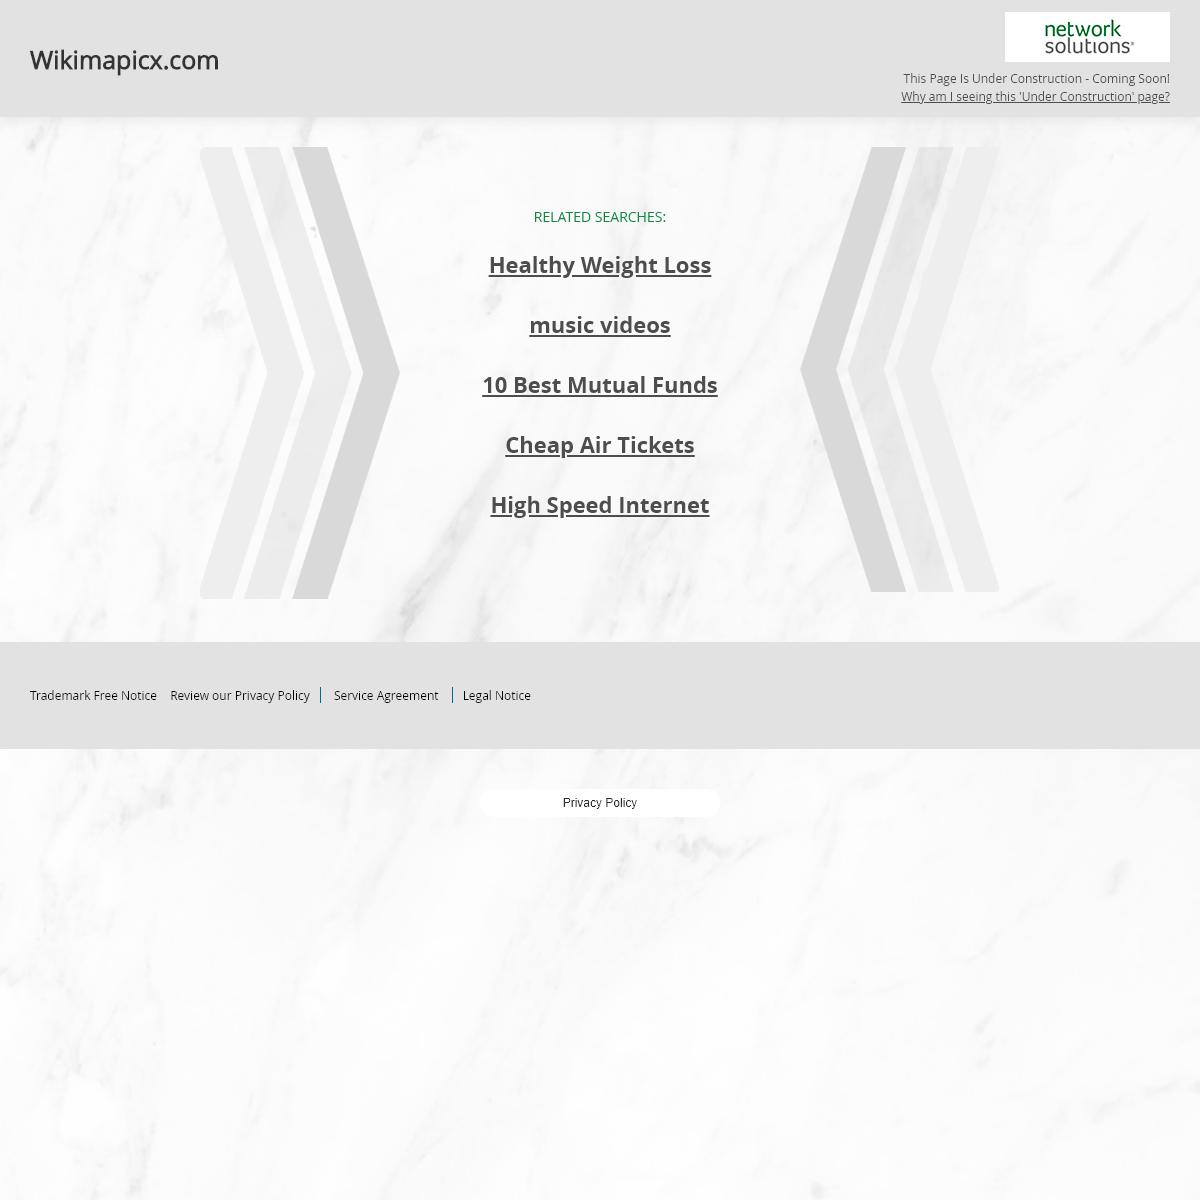 Wikimapicx.com